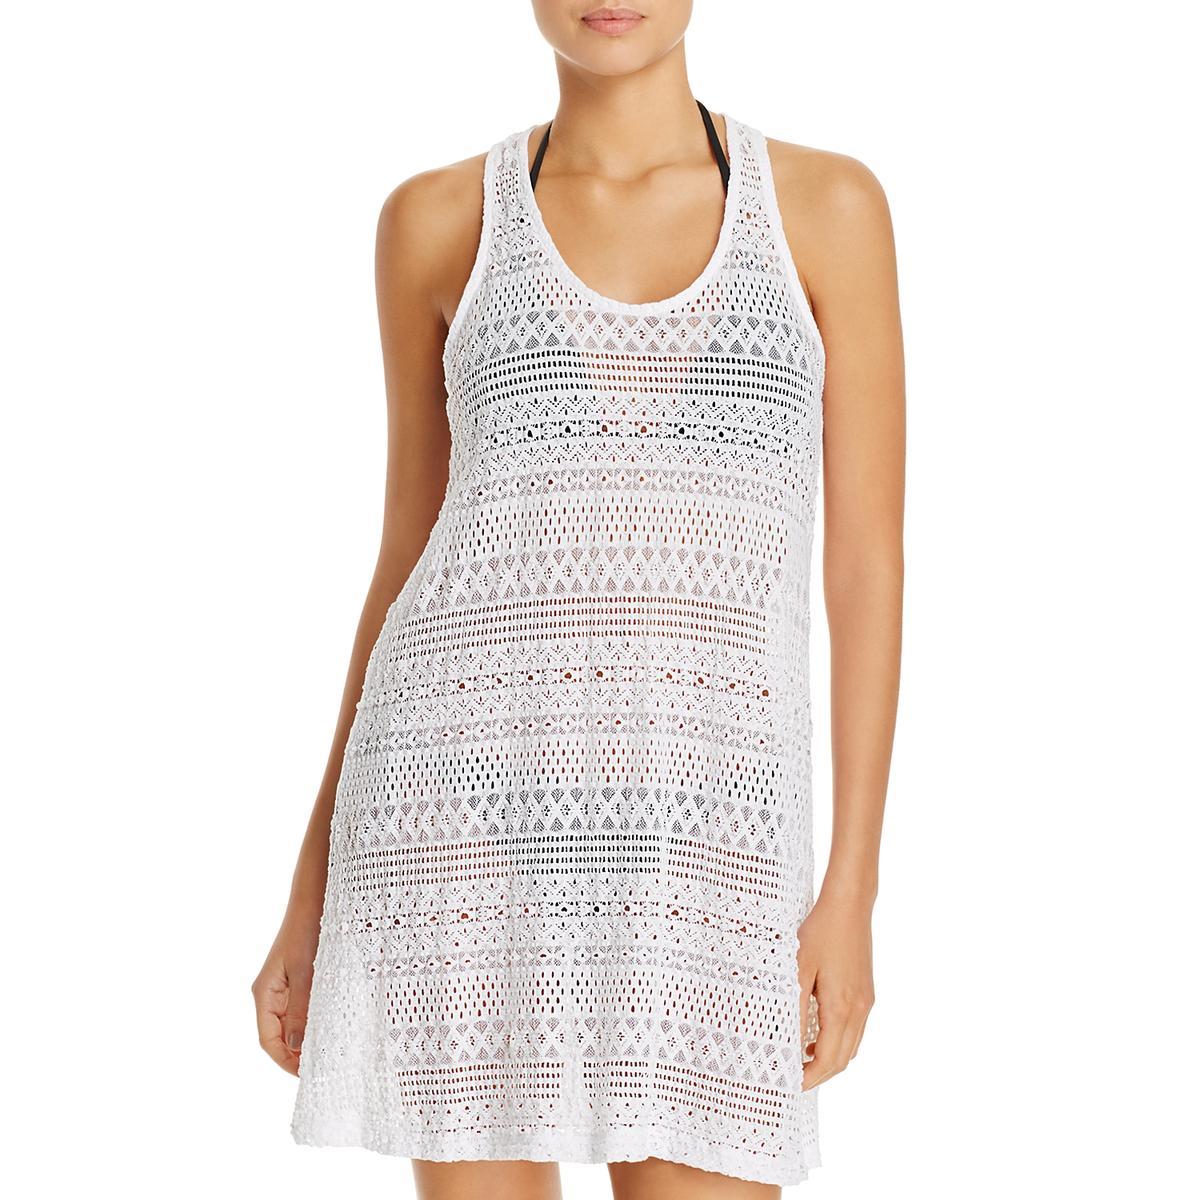 1da94ff2e95 Details about J Valdi Womens Lace Tank Sleeveless Dress Swim Cover-Up BHFO  7768